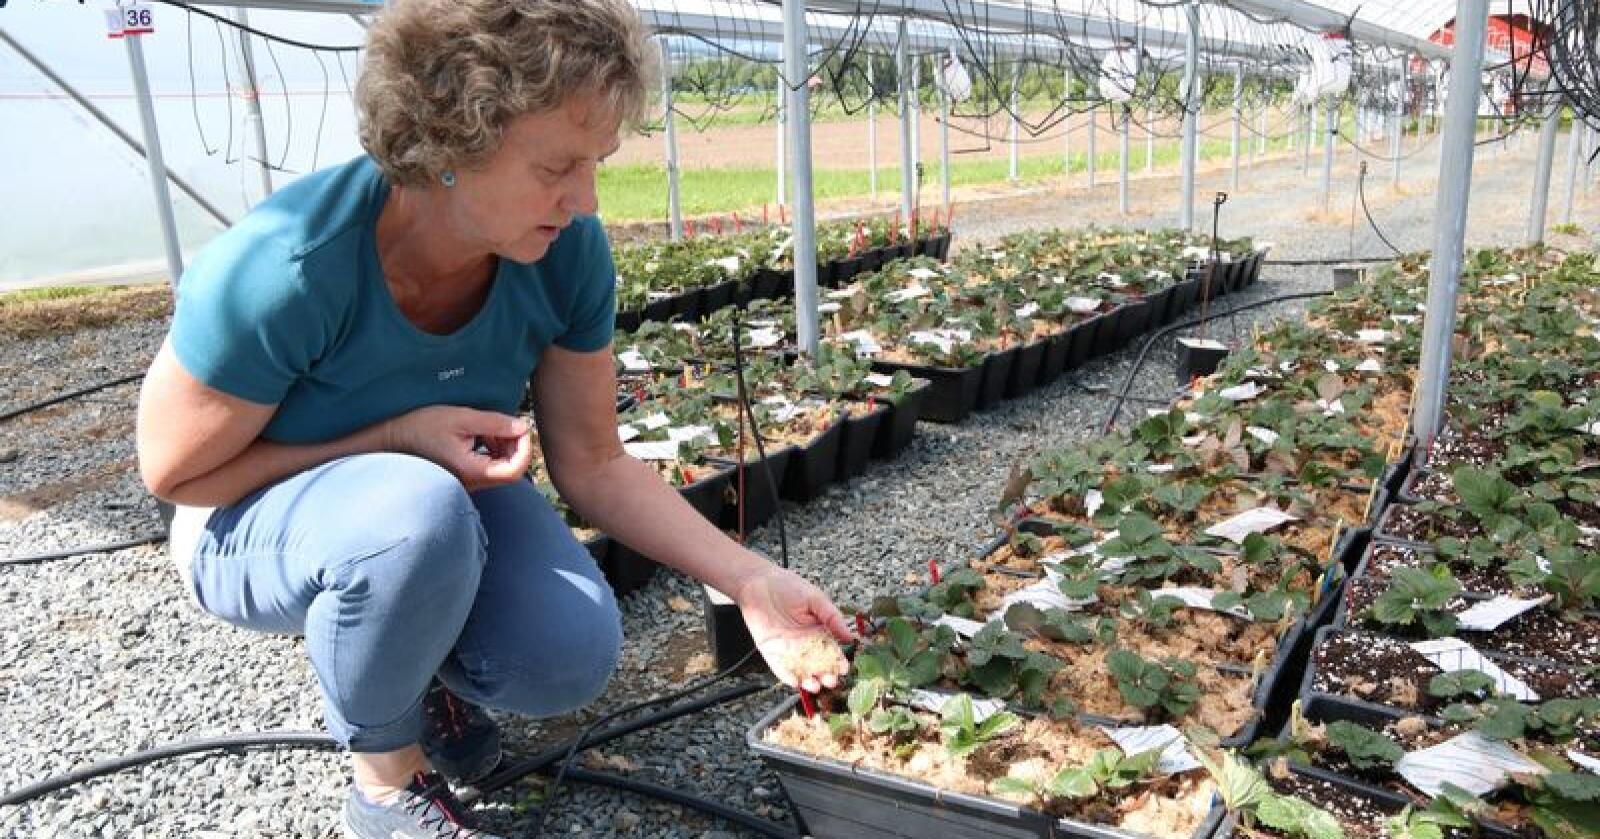 Hos NIBIO på Apelsvoll dyrkes det jordbær i et substrat av trefiber, forklarer seniorforsker Anita Sønsteby. Foto: Dag Idar Jøsan